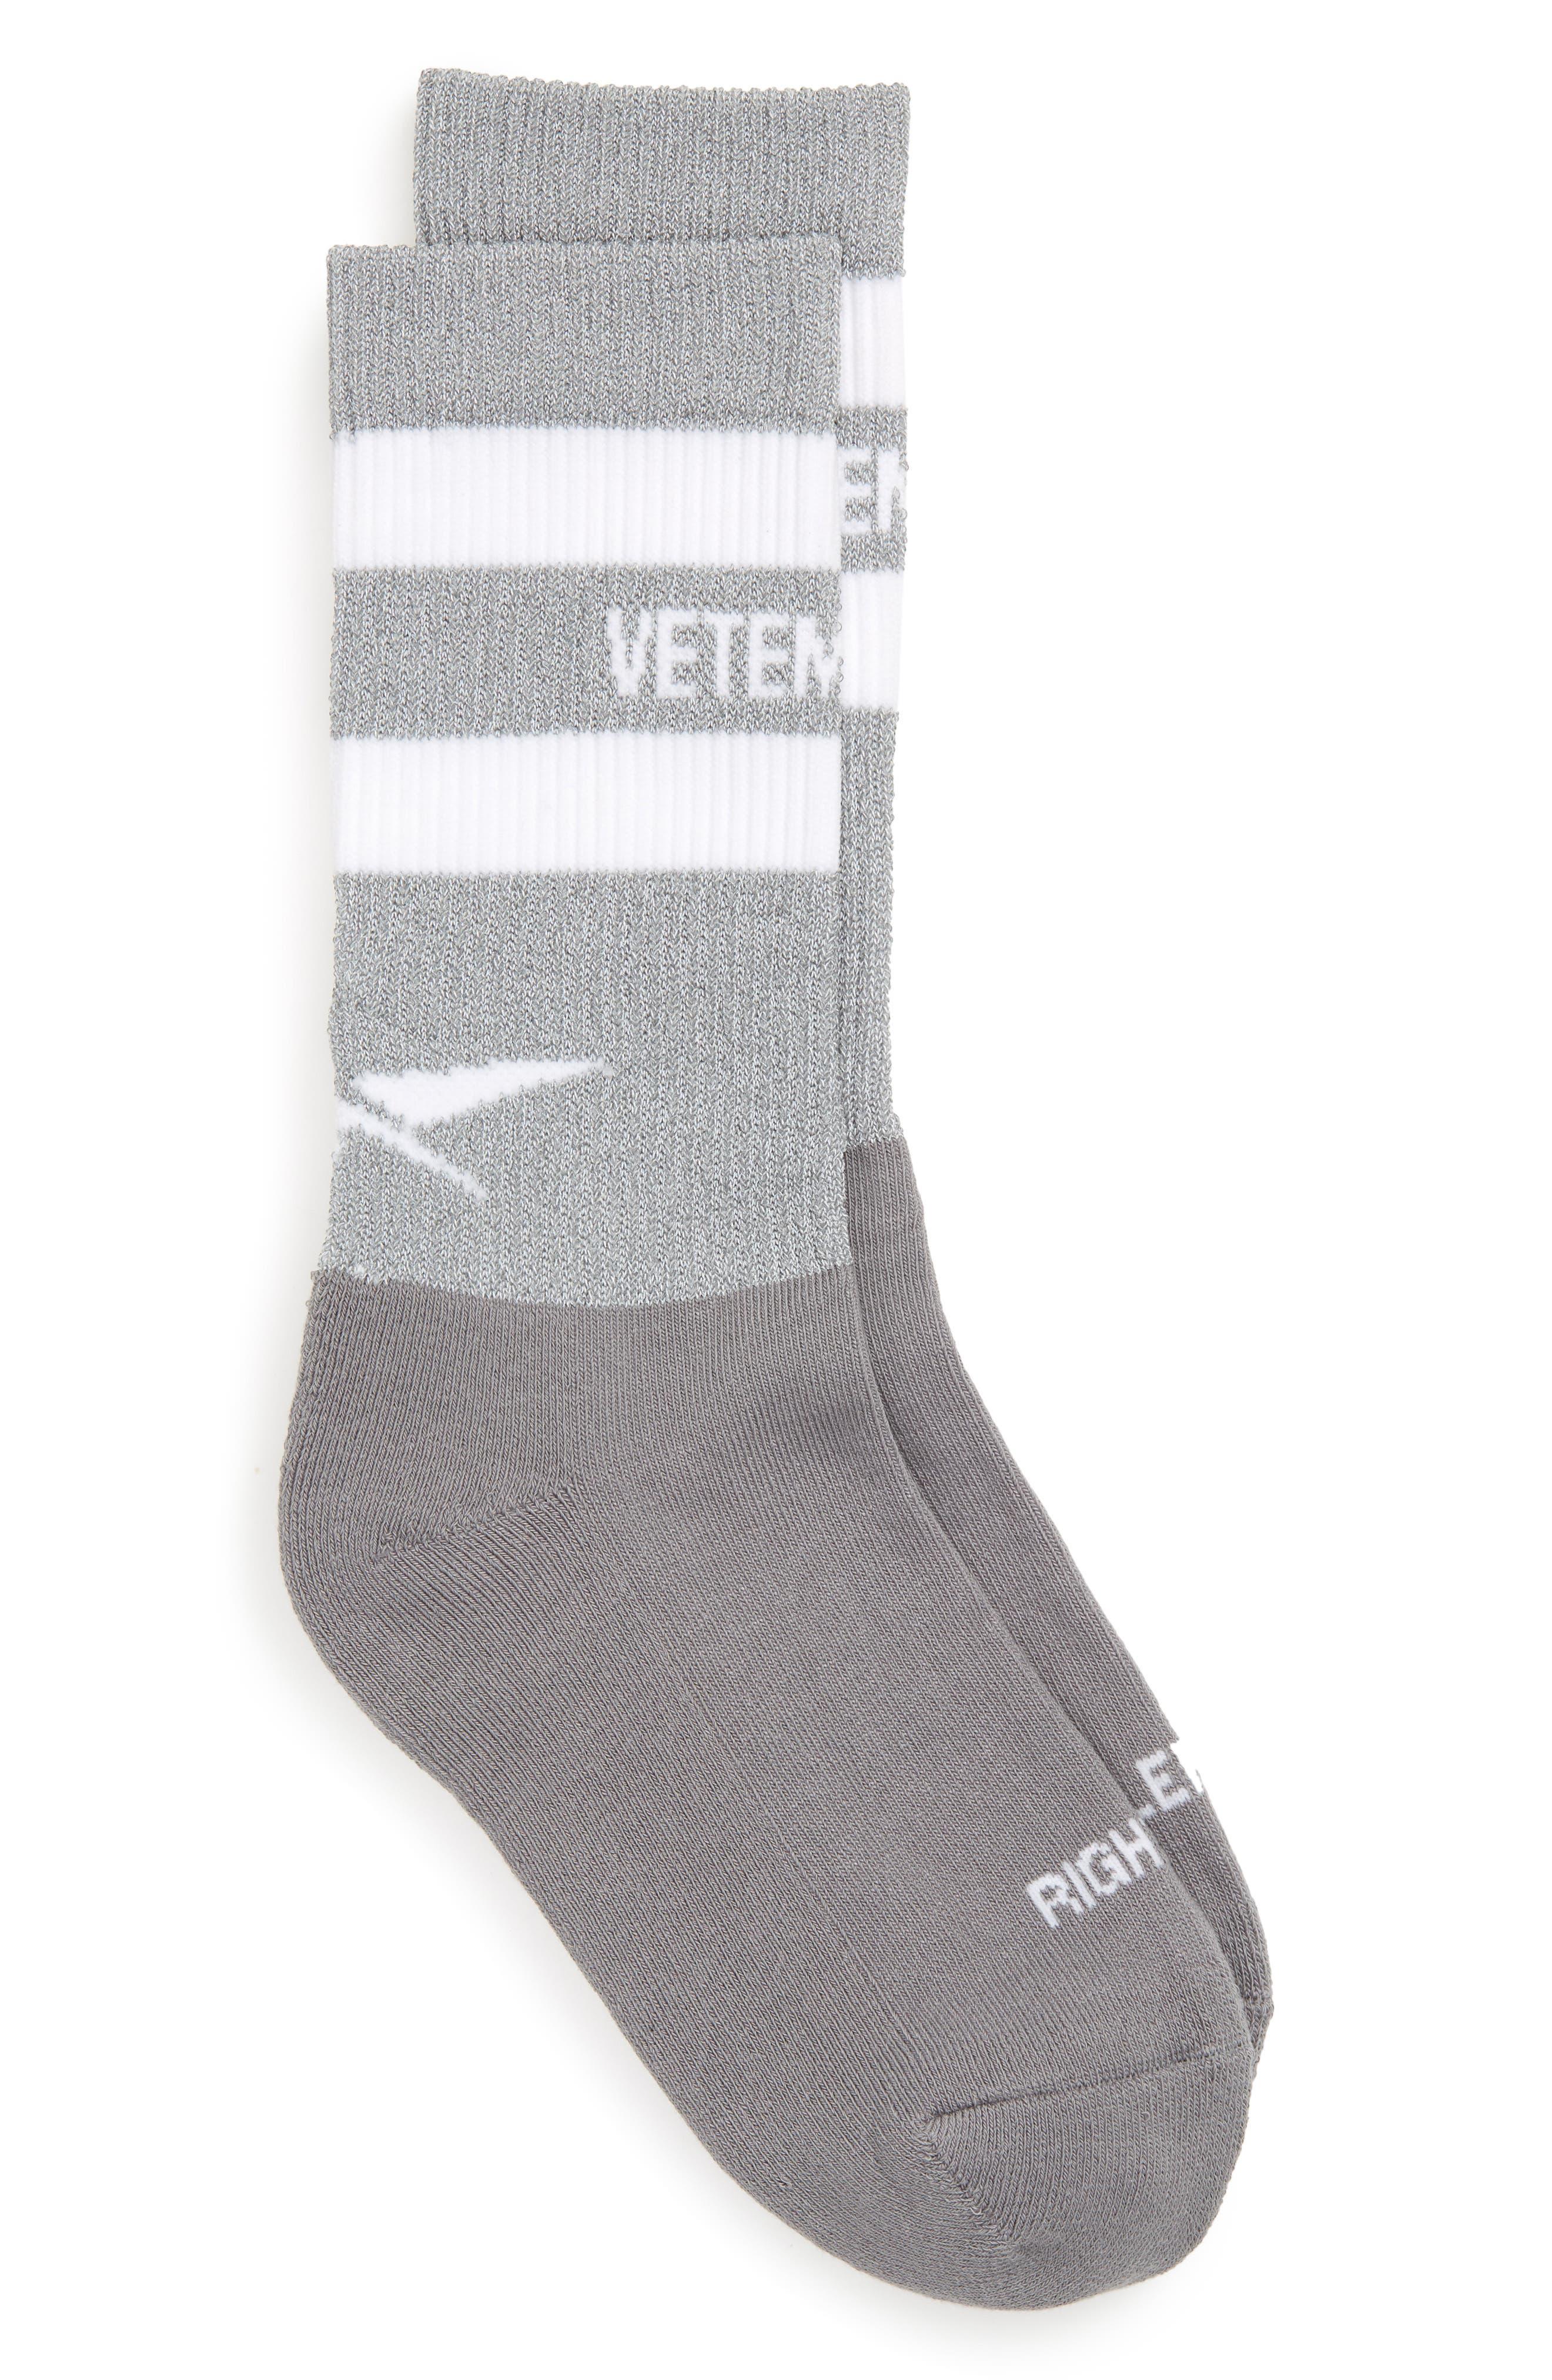 Reflective Socks,                         Main,                         color, 020